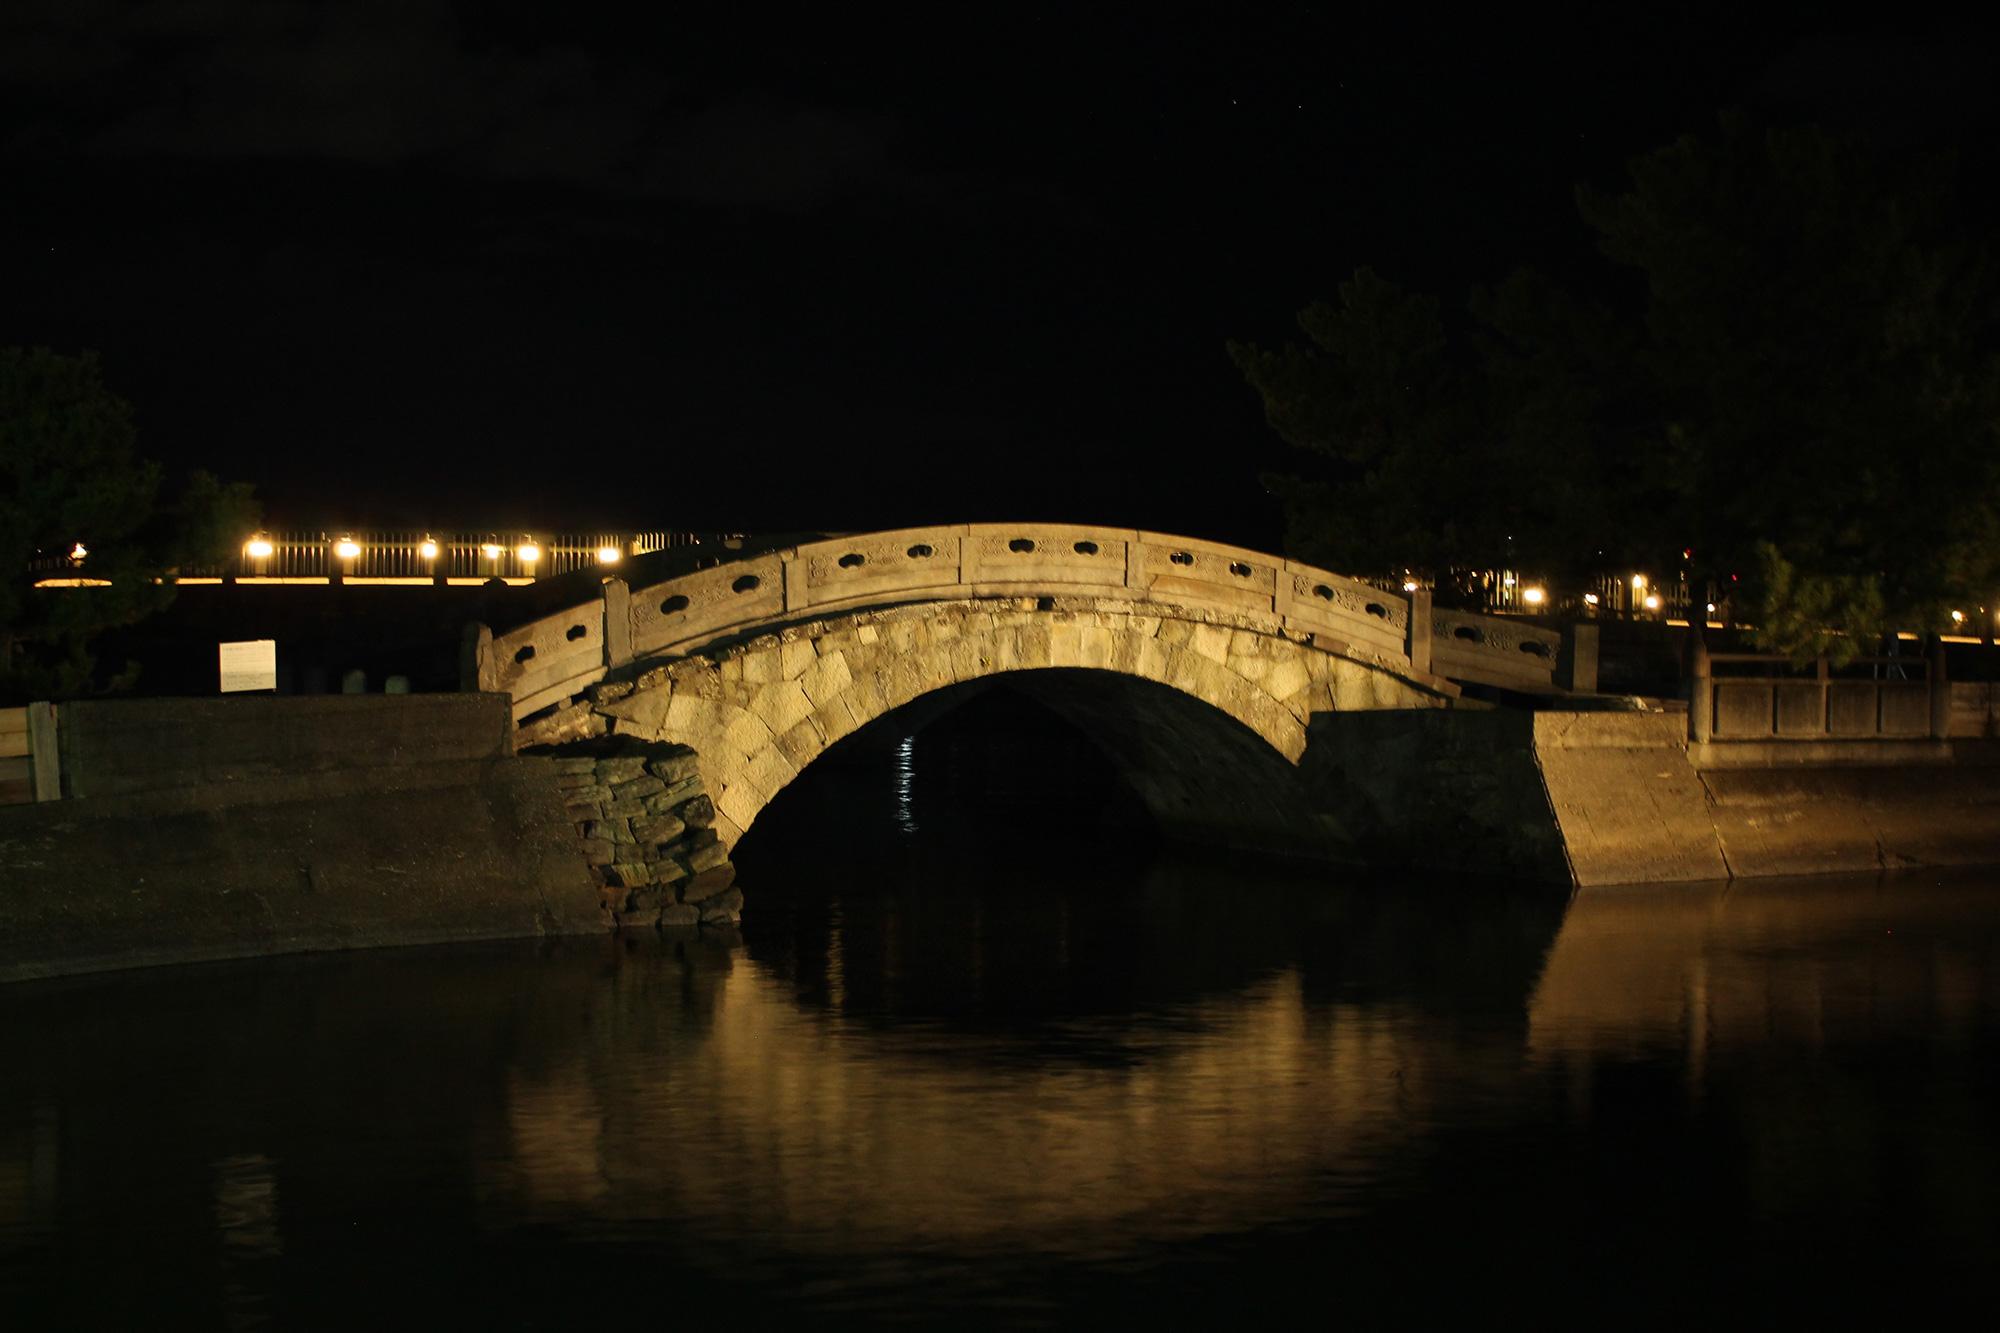 Furo-bashi Bridgeの写真